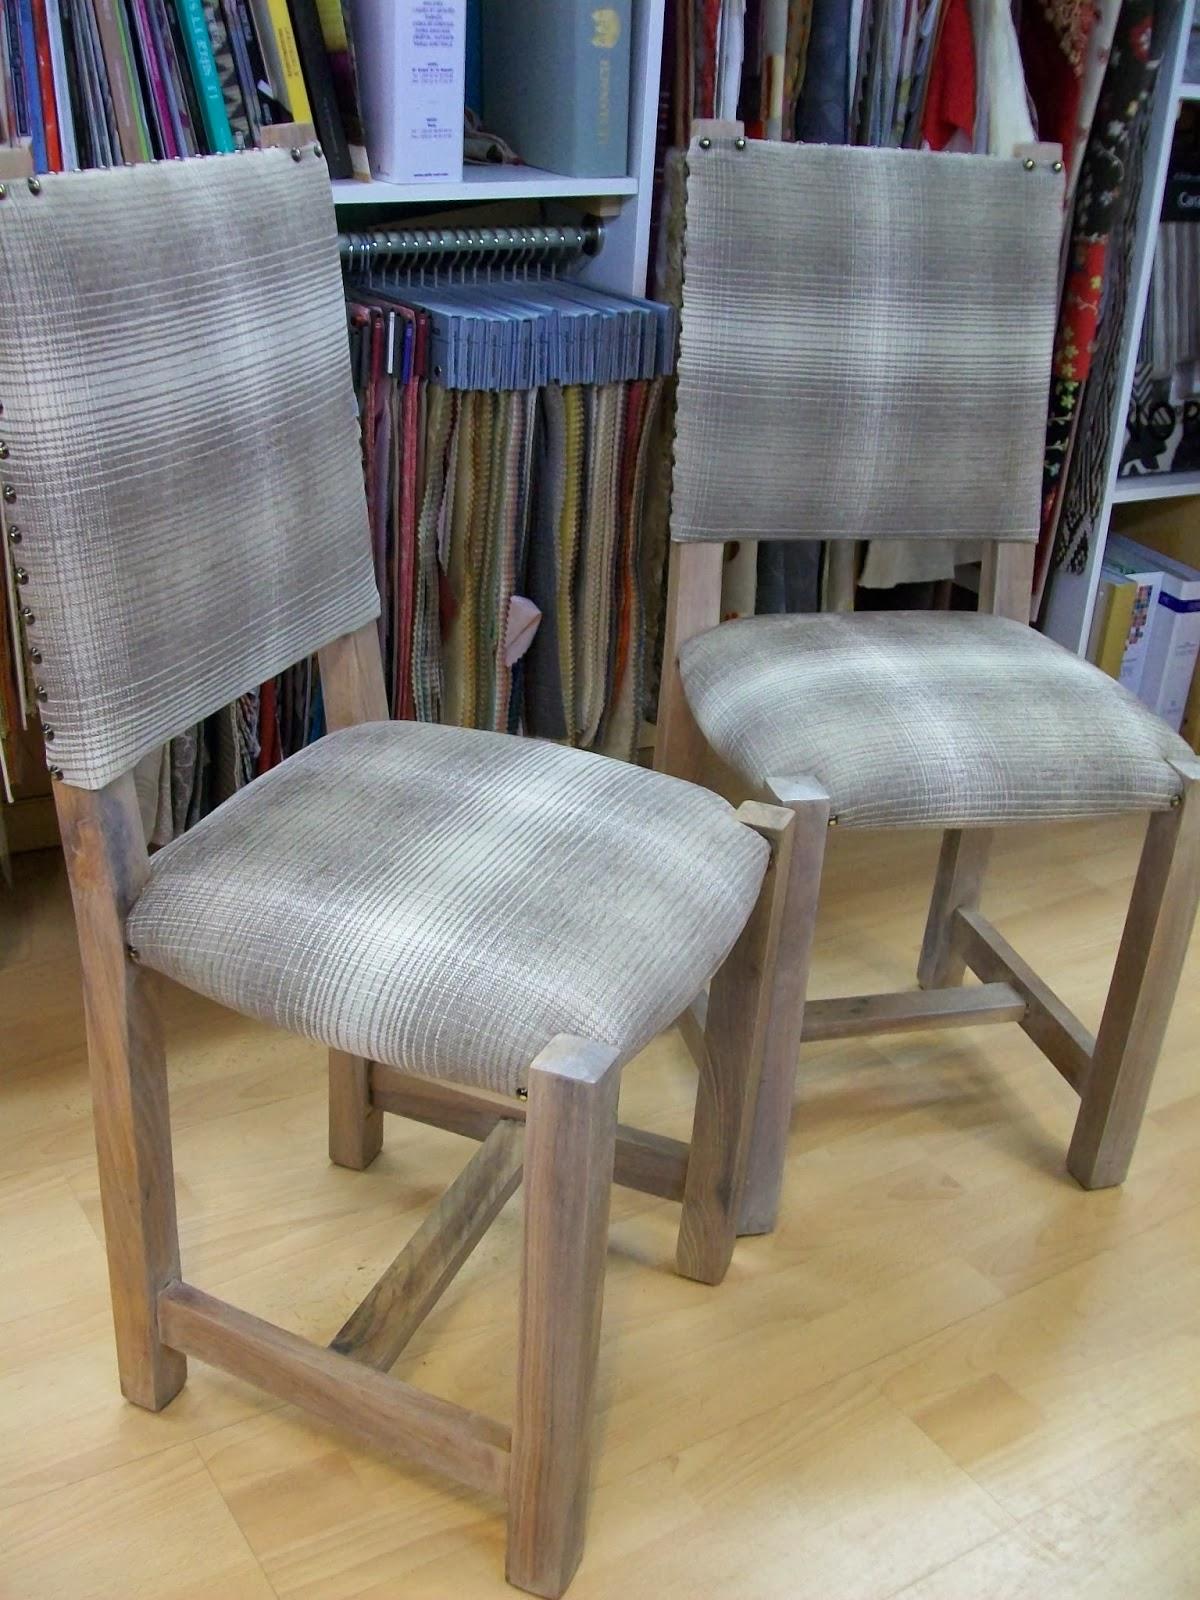 L 39 chaise paill en garniture tissu - Nettoyer chaise en paille ...